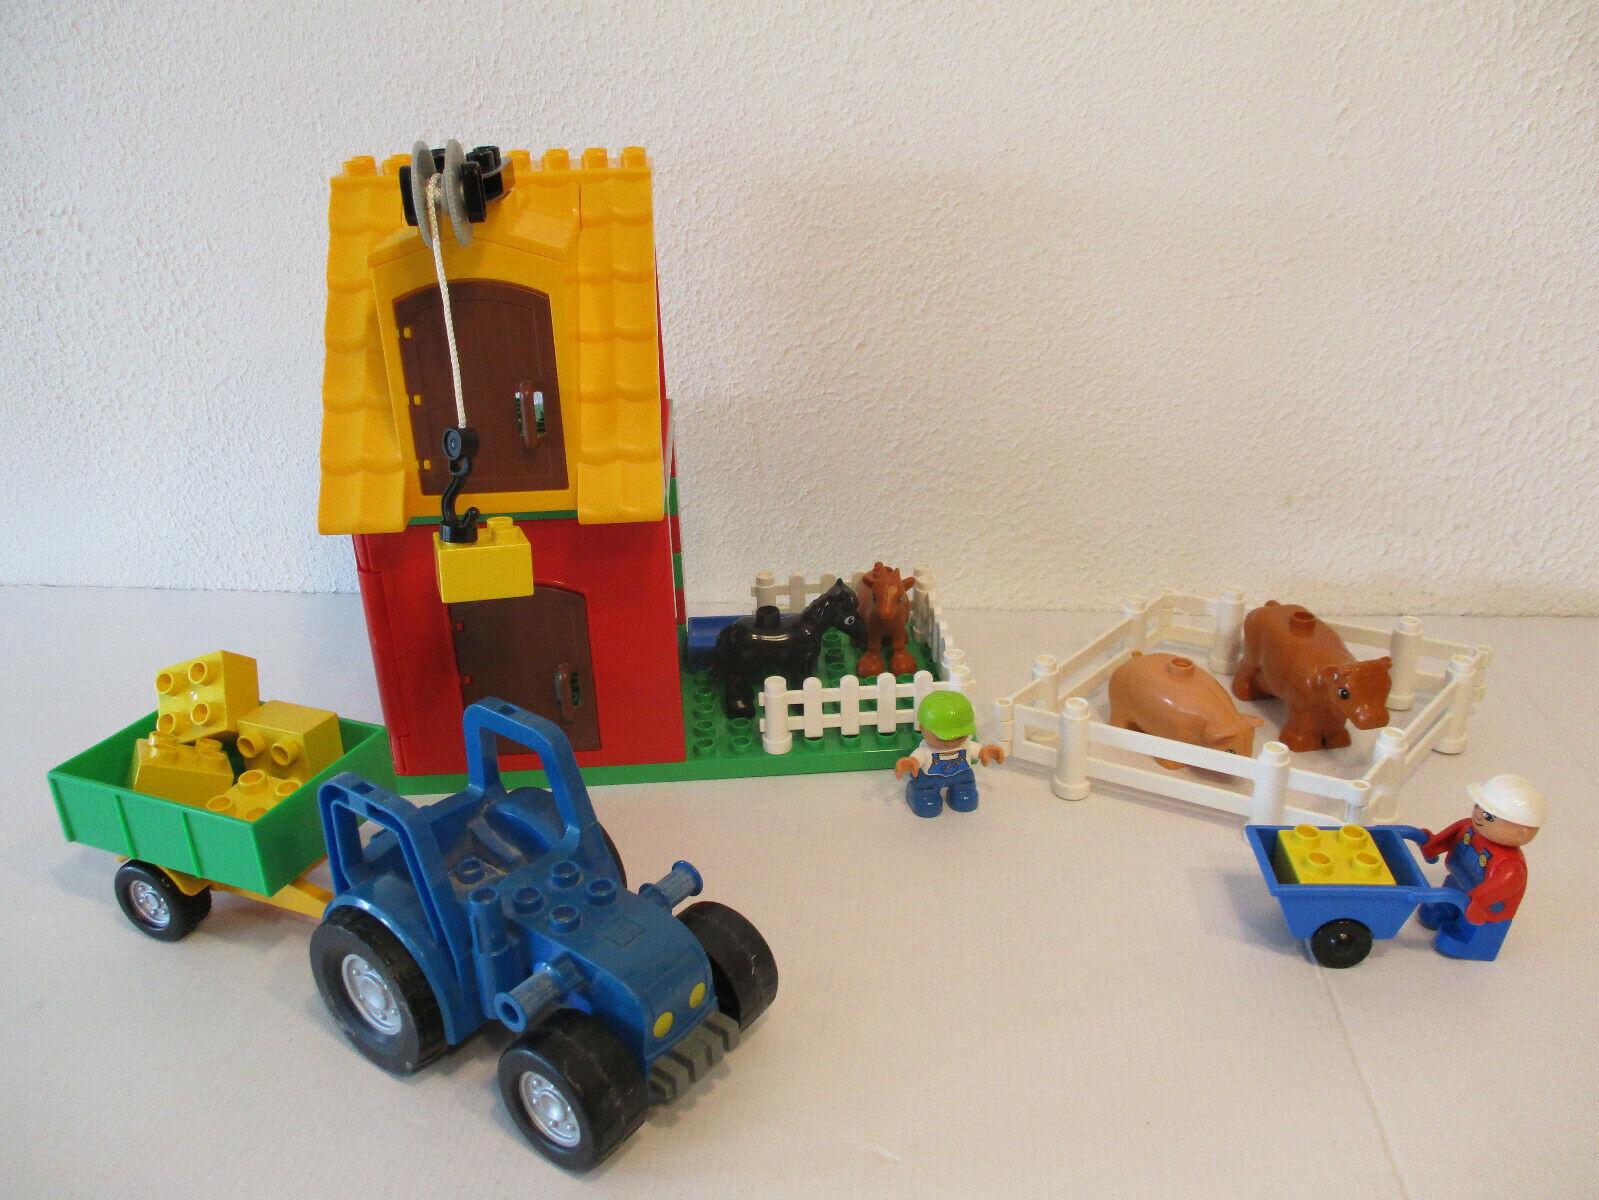 (Hk) Lego Duplo Farm Figurine Constructor Constructor Constructor Tractor with Trailer Animals d64174